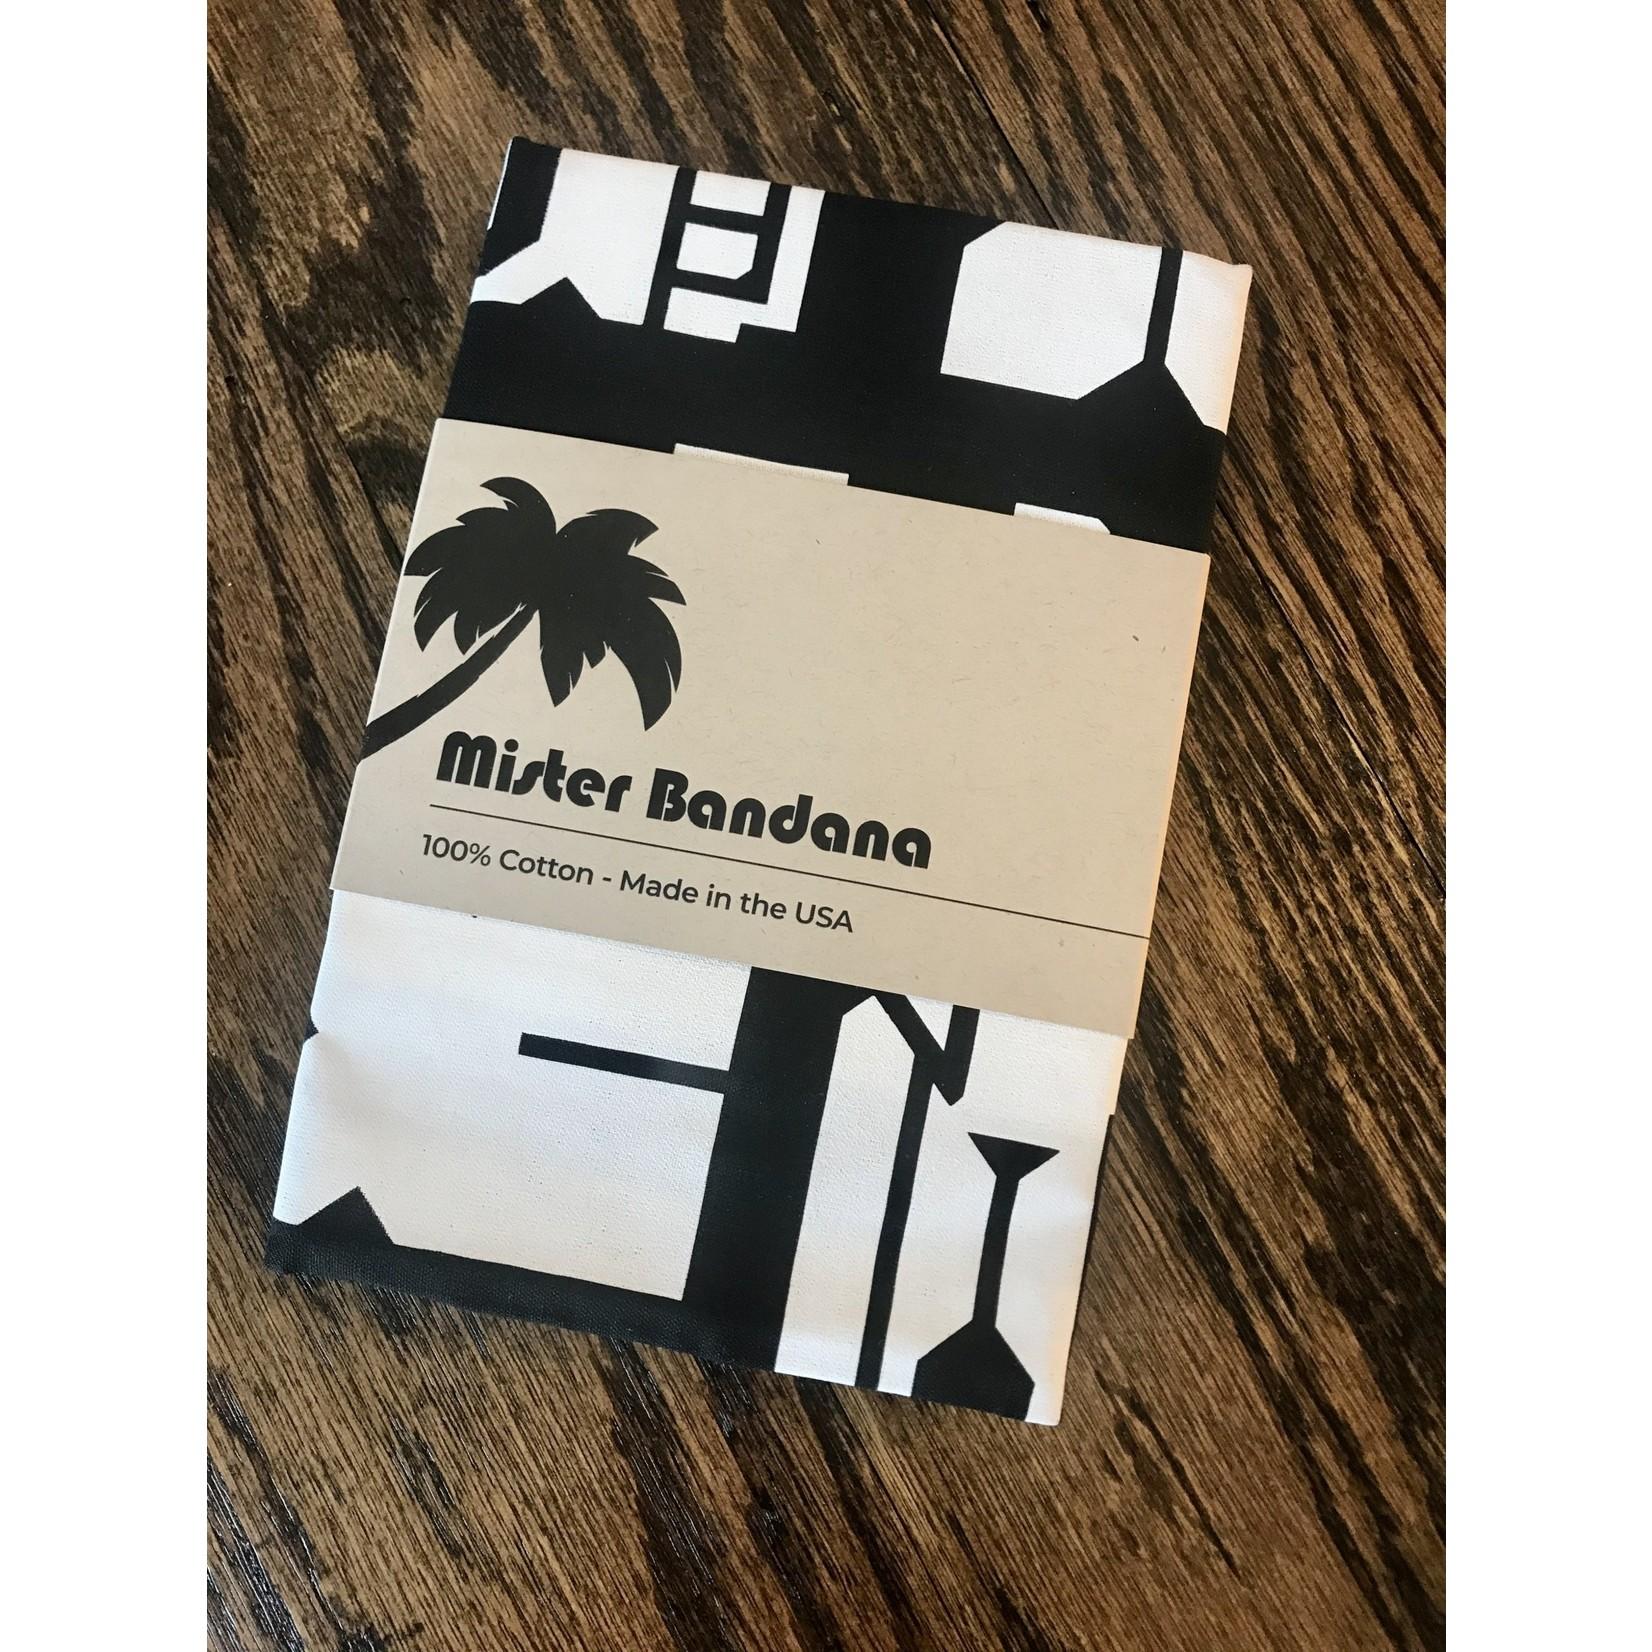 Mister Bandana (QO) Mister Bandana Bandanas